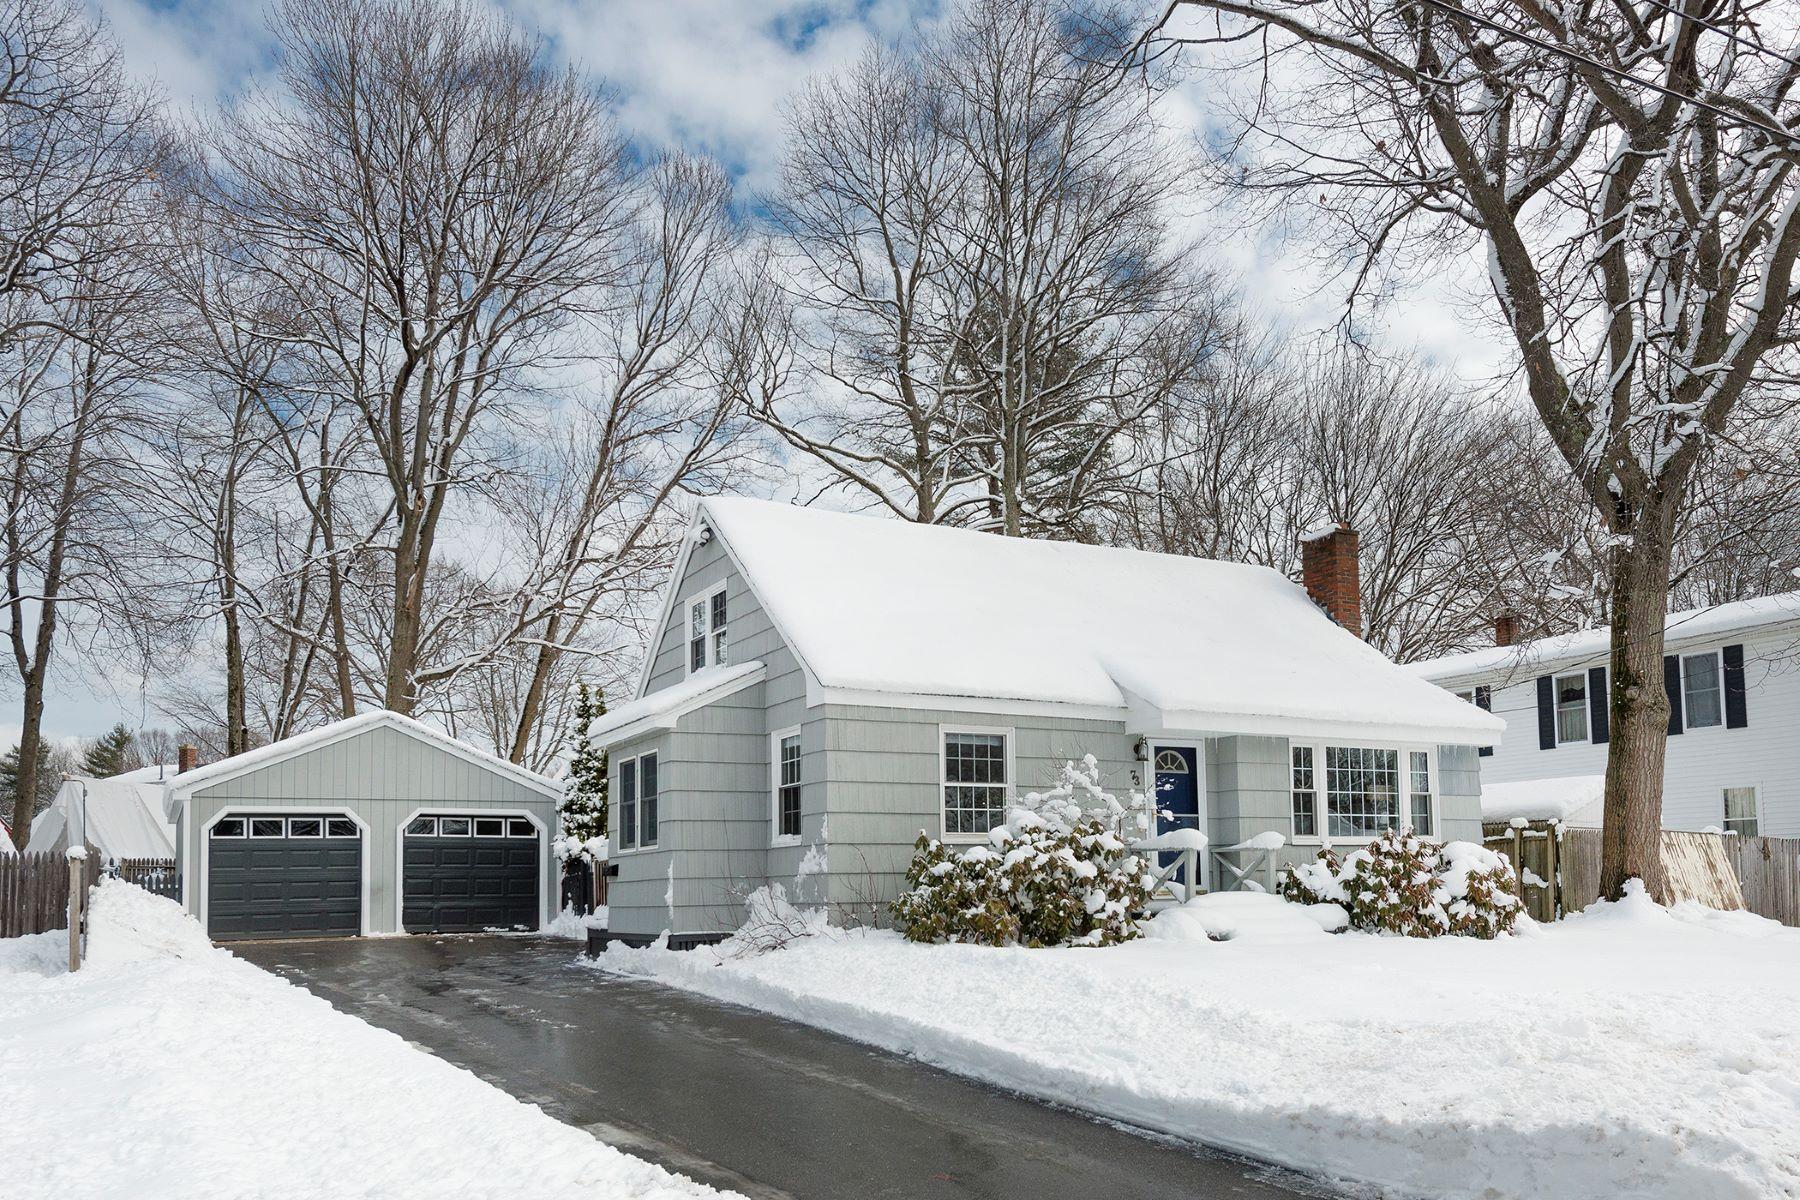 Single Family Home for Sale at 73 Sunset Lane 73 Sunset Lane Portland, Maine 04102 United States